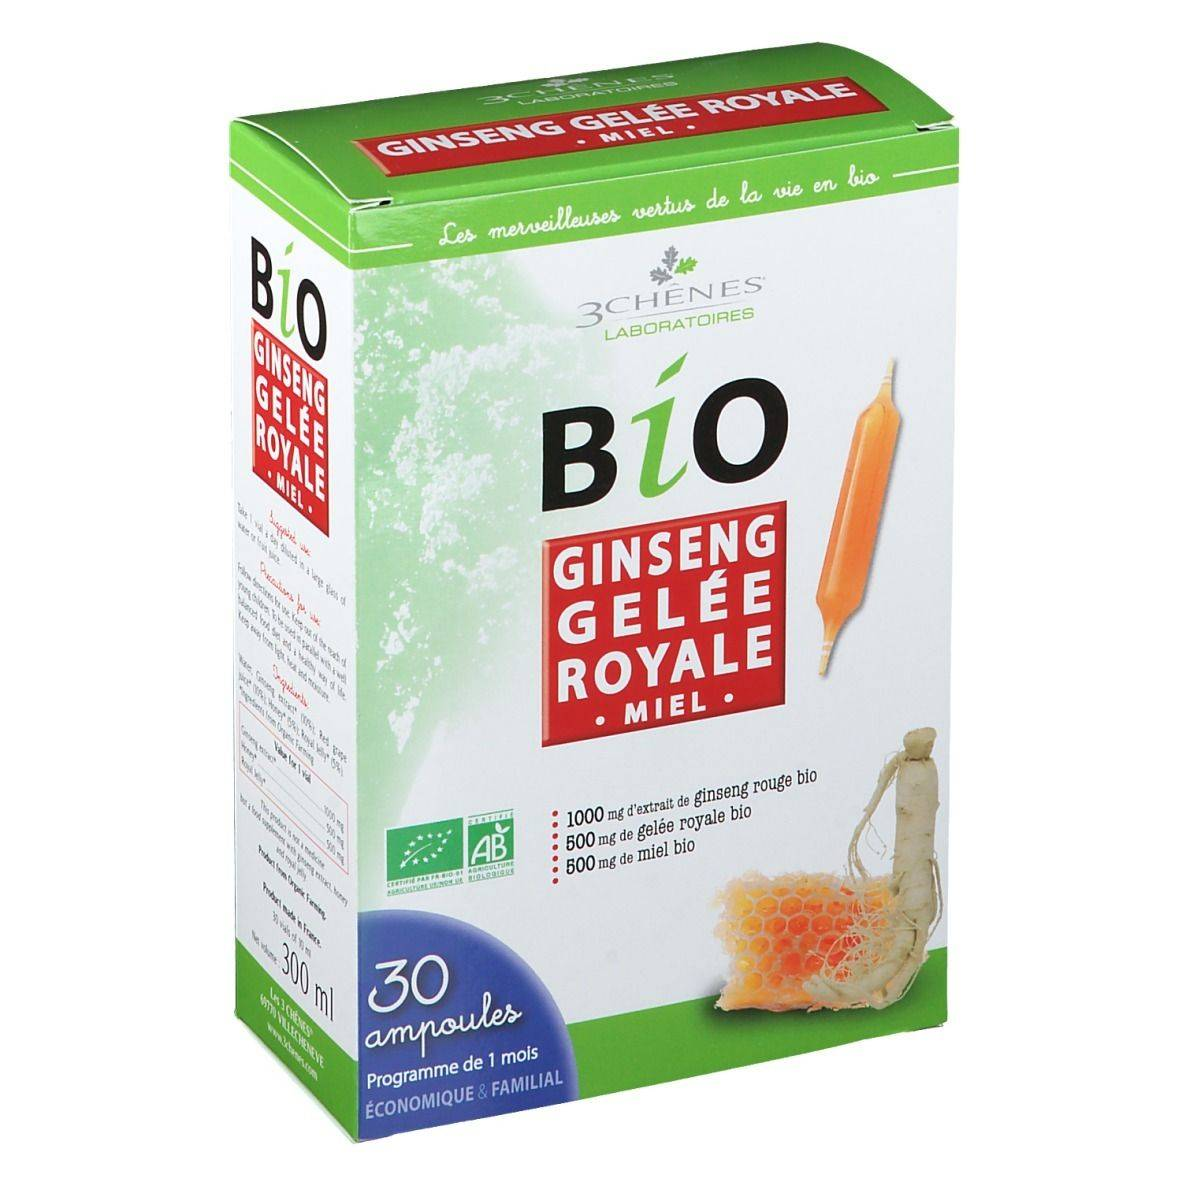 3Chênes® 3 Chênes Bio Ginseng Gelée Royale Miel ml ampoule(s) buvable(s)